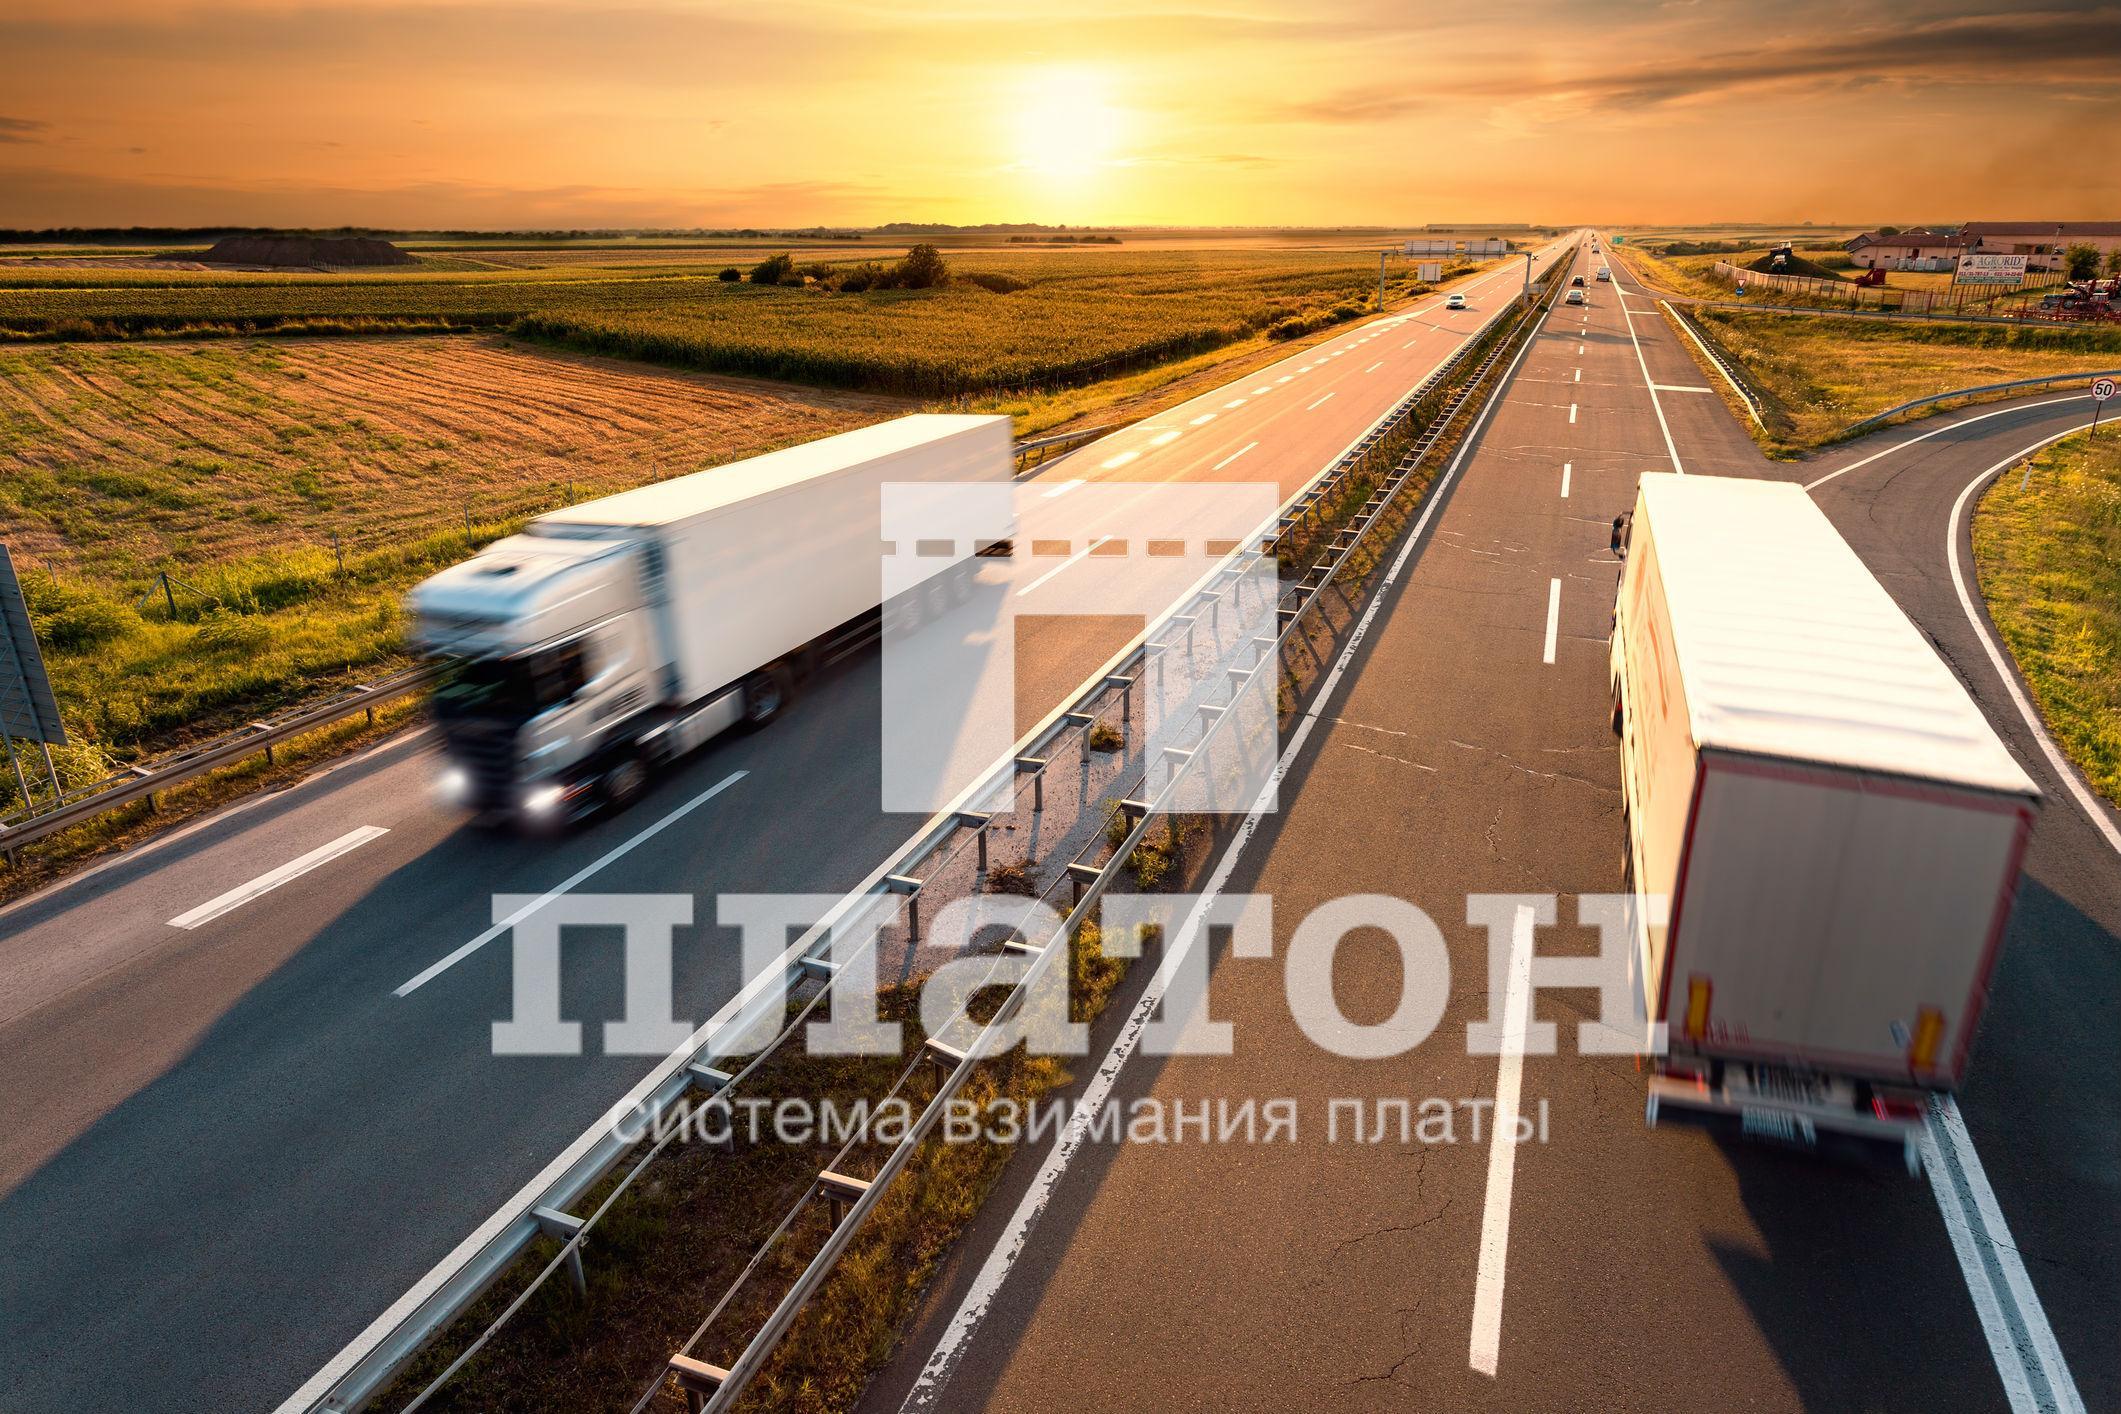 Транспортная система «Платон»